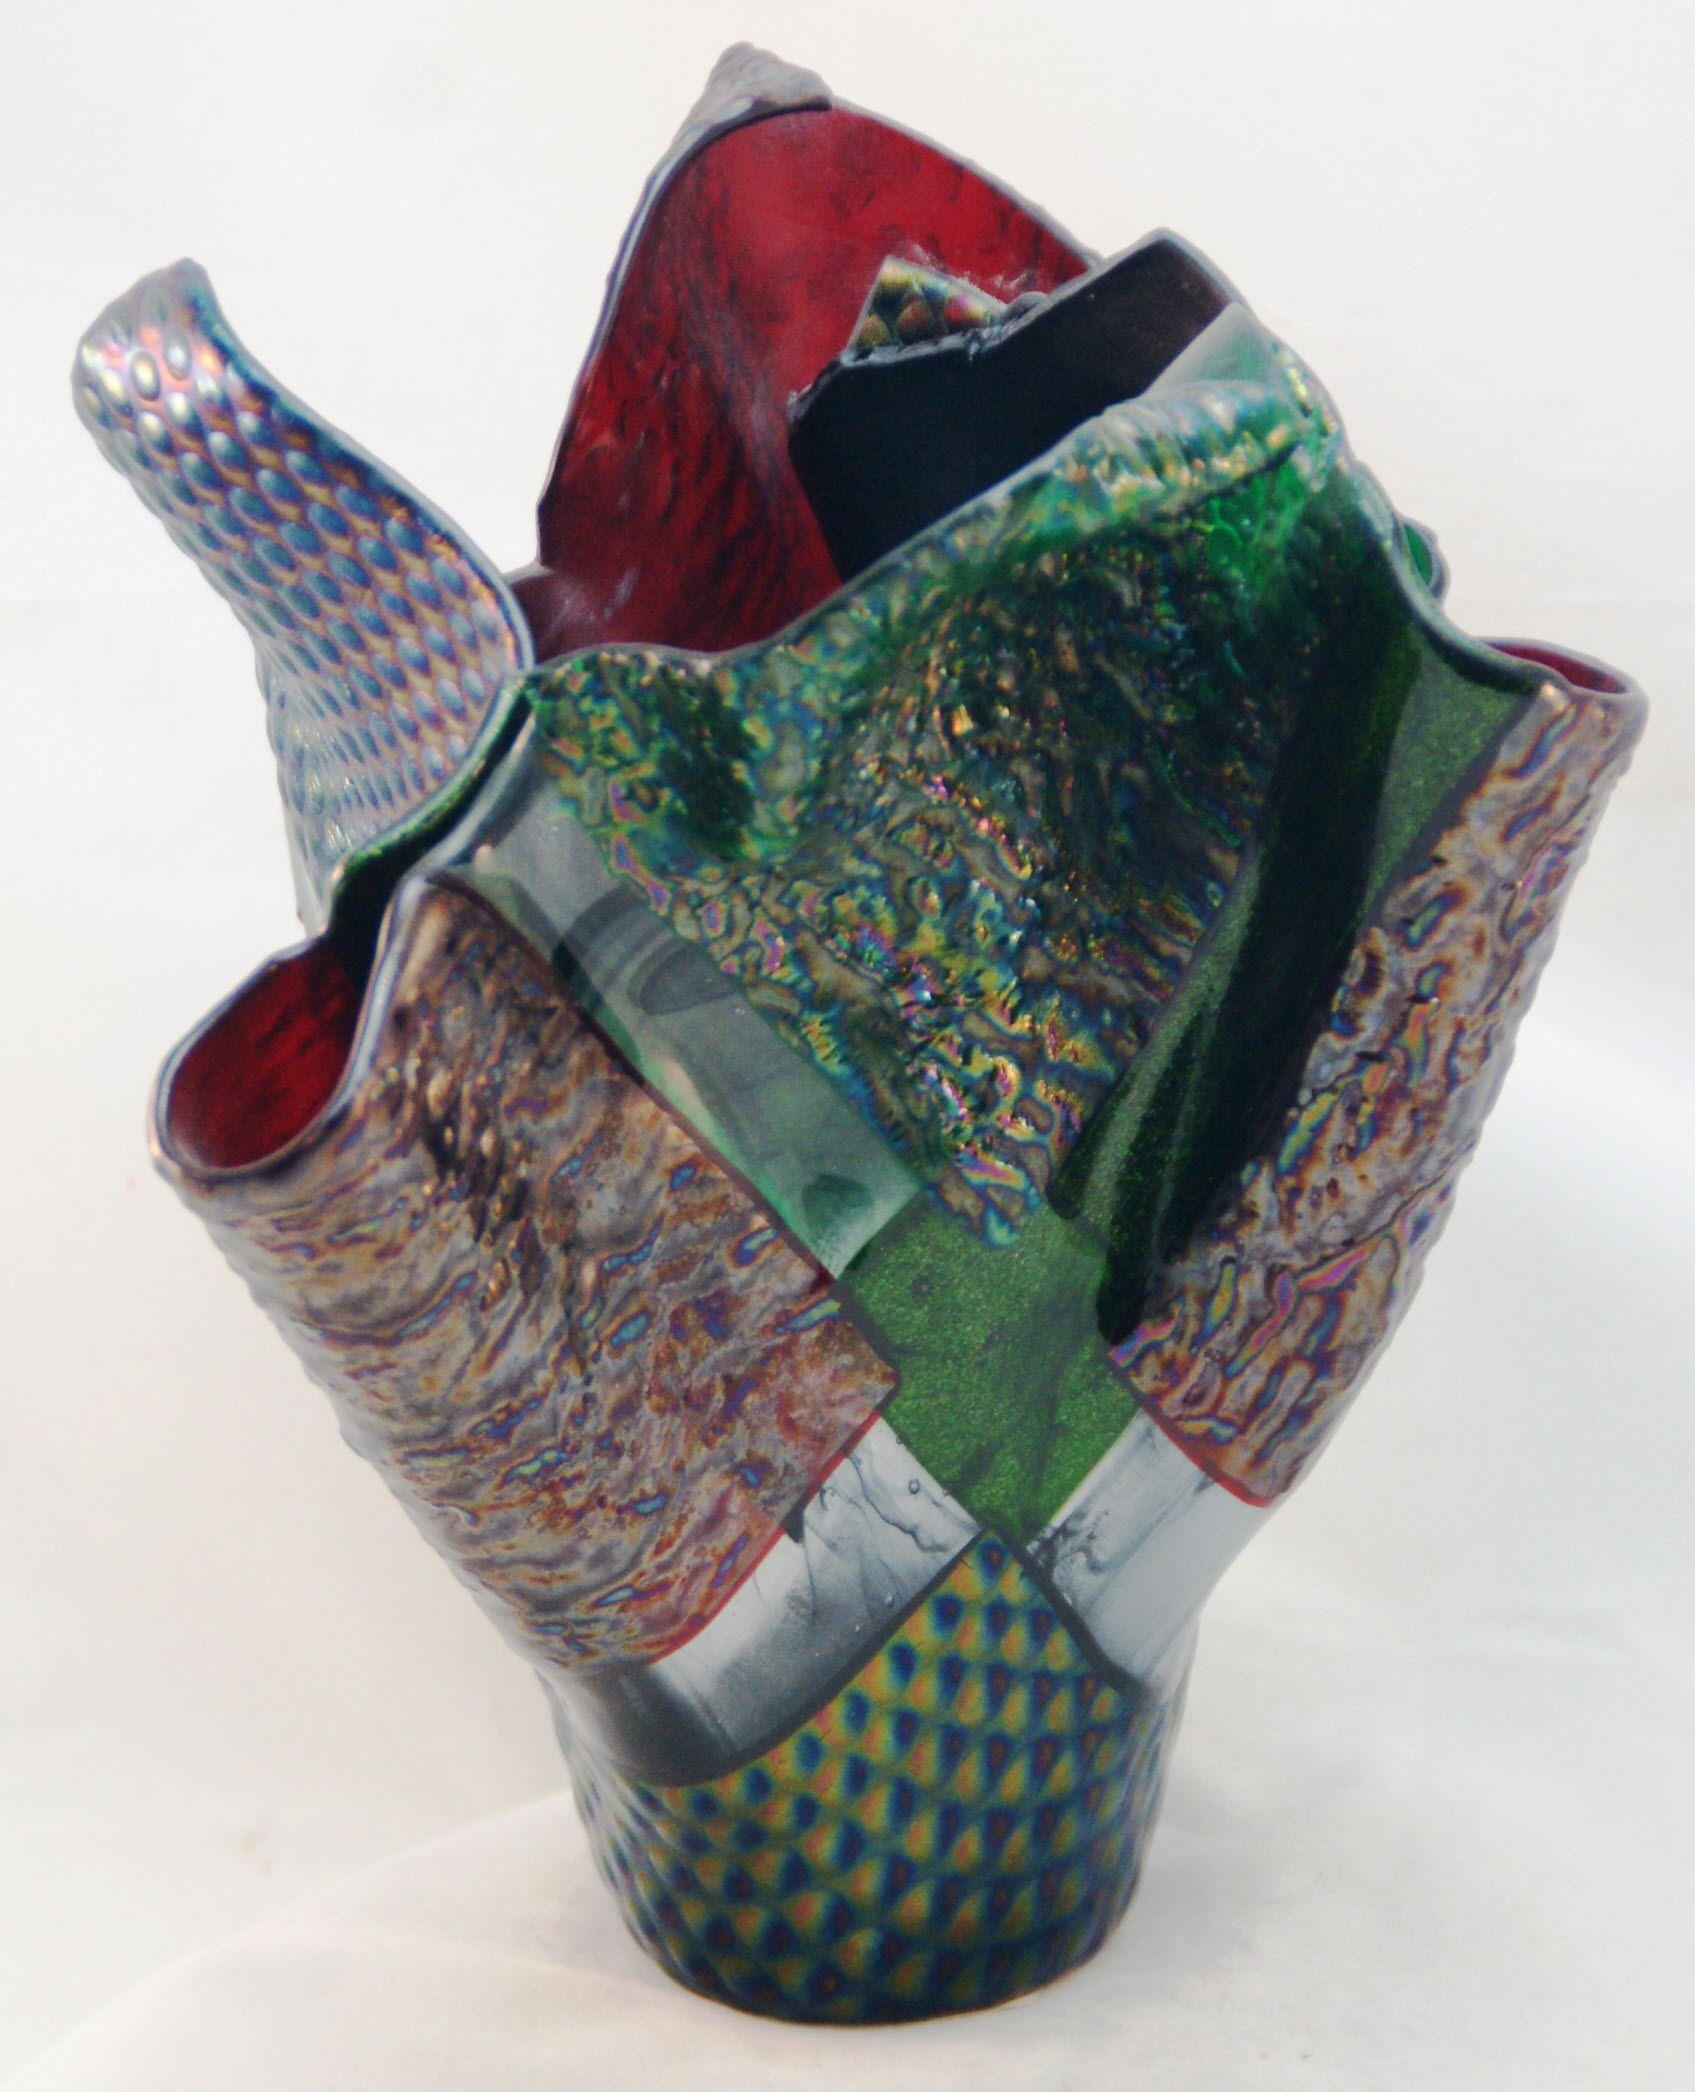 Fused glass vases fused glass glass vase decor glass vase